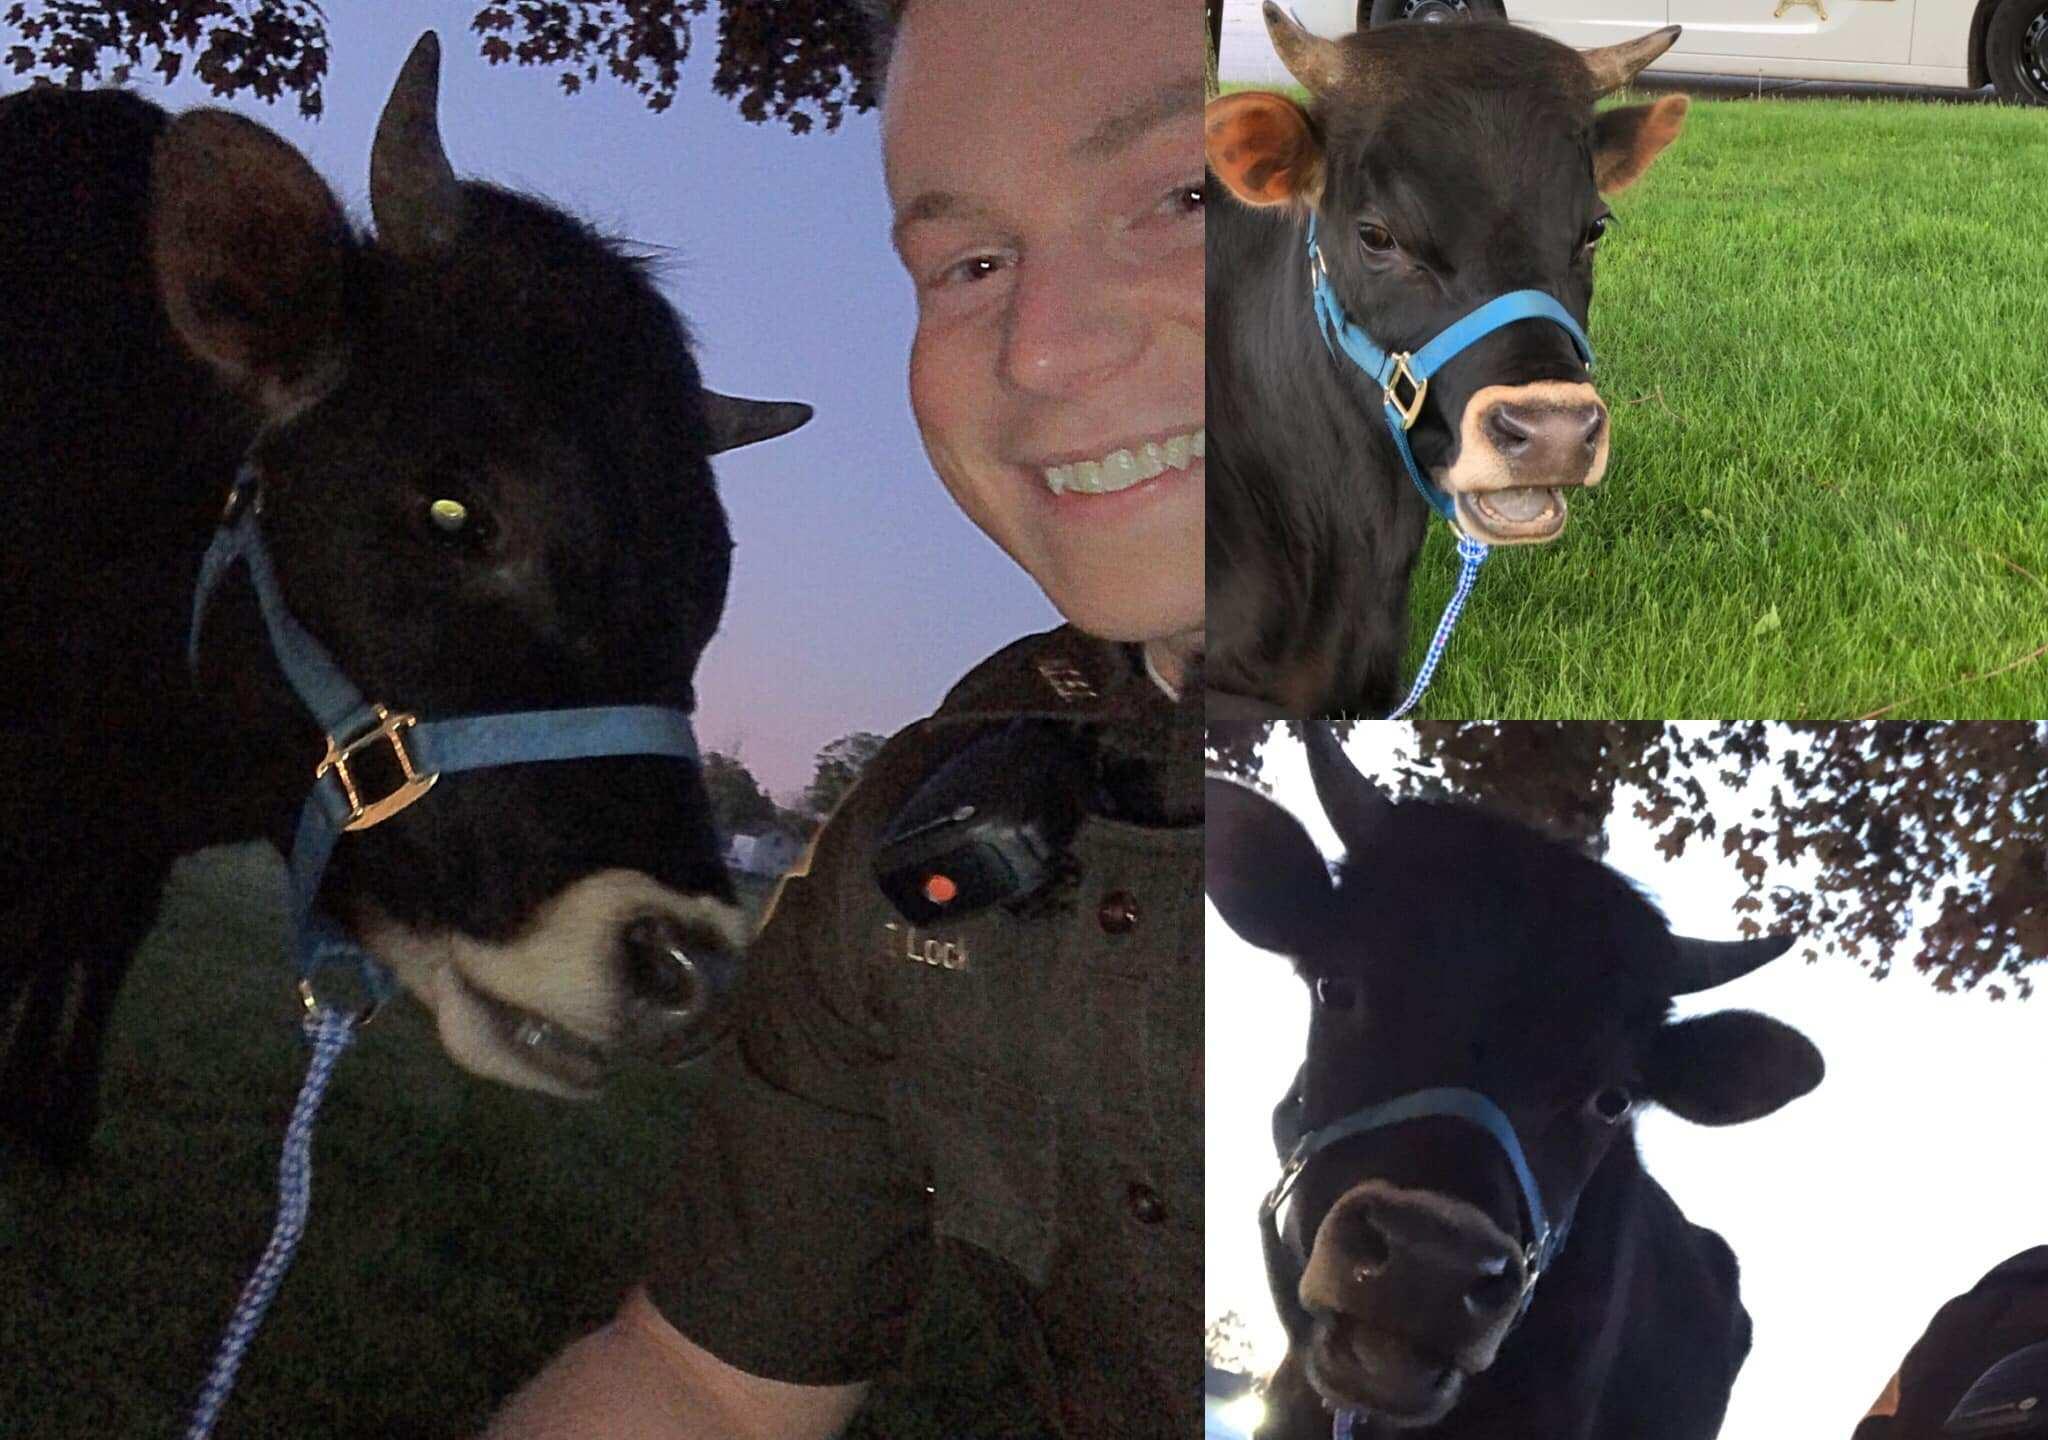 deputy and cow_1557938339257.jpg.jpg